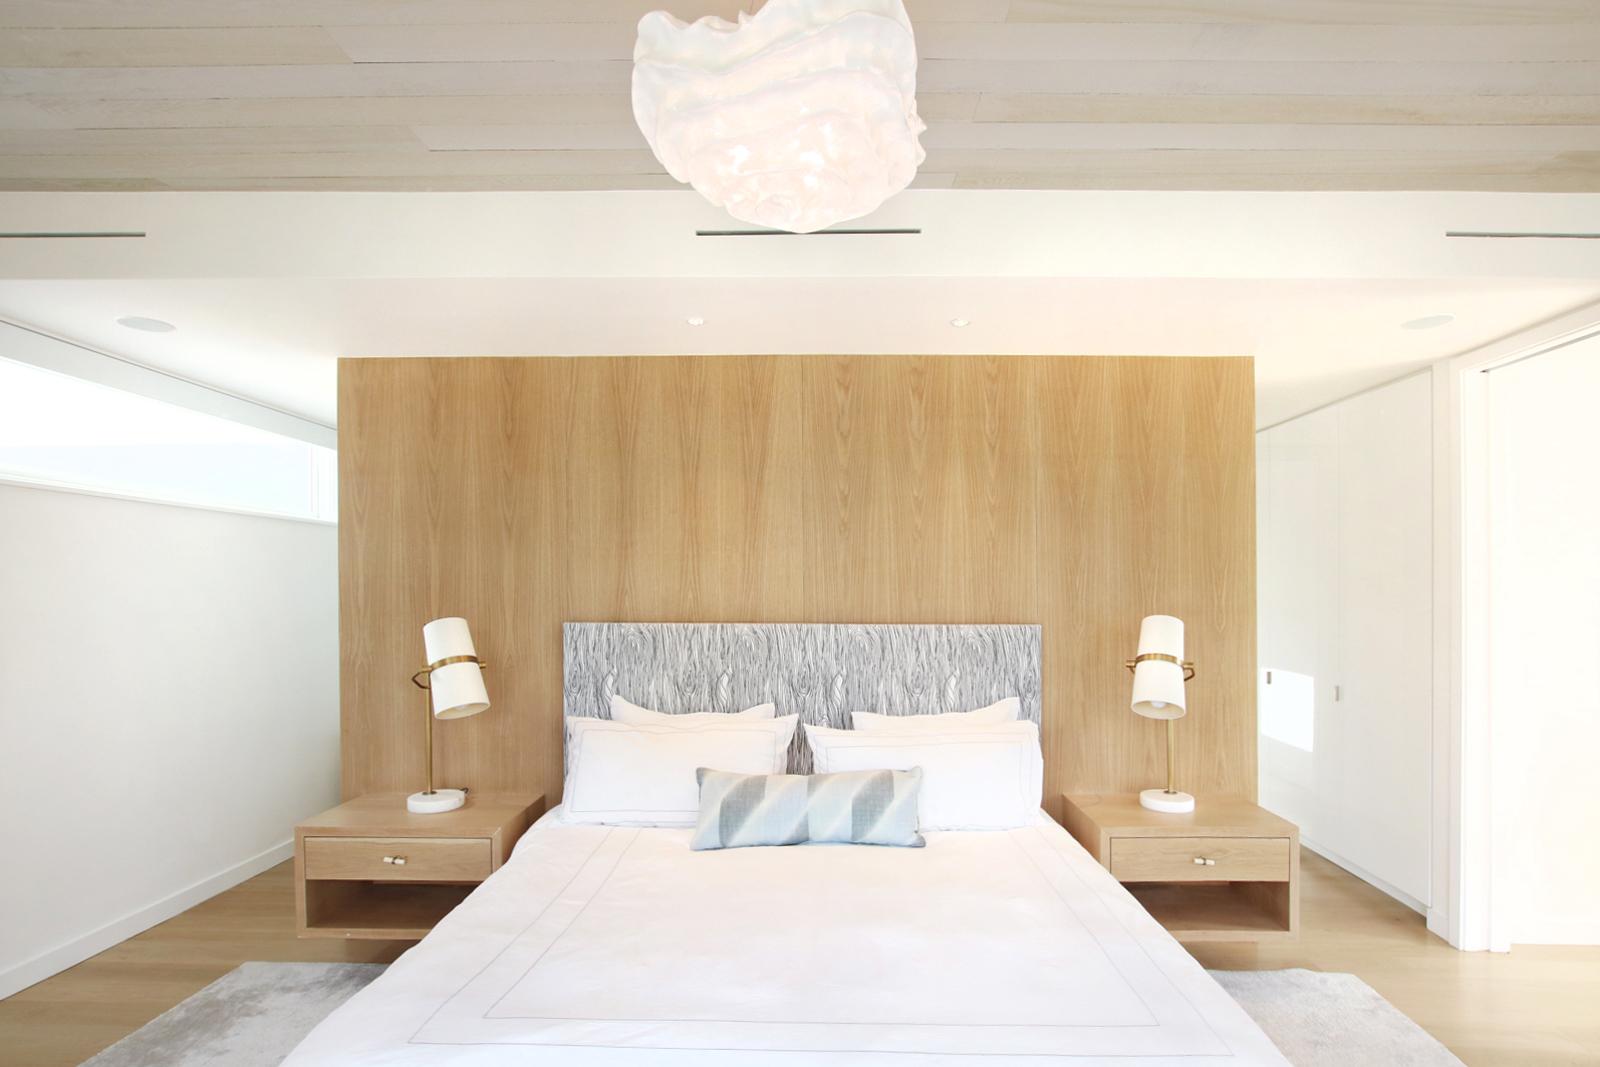 15-re4a-resolution-4-architecture-modern-modular-prefab-bridgehampton house-interior-master-bed-room.jpg